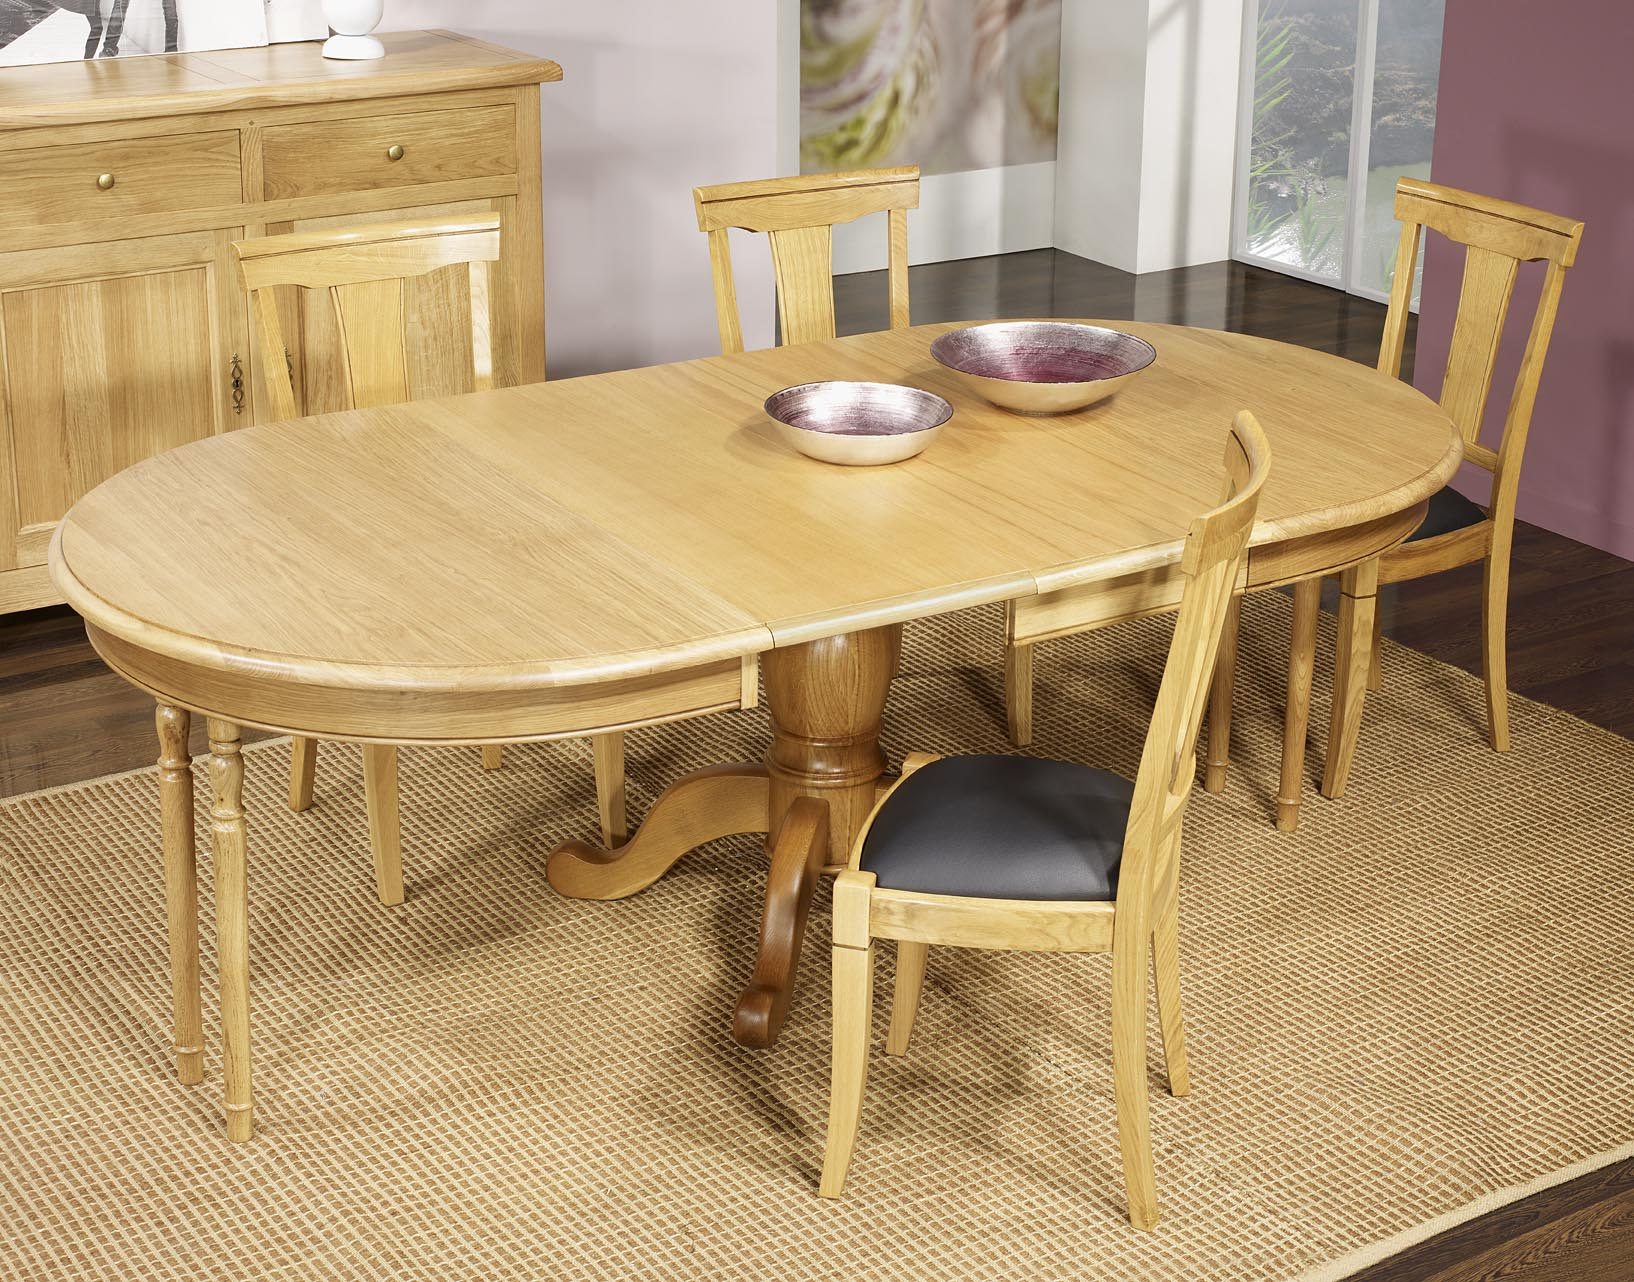 Table ovale pied central j r me en ch ne massif de style for Table ovale chene massif